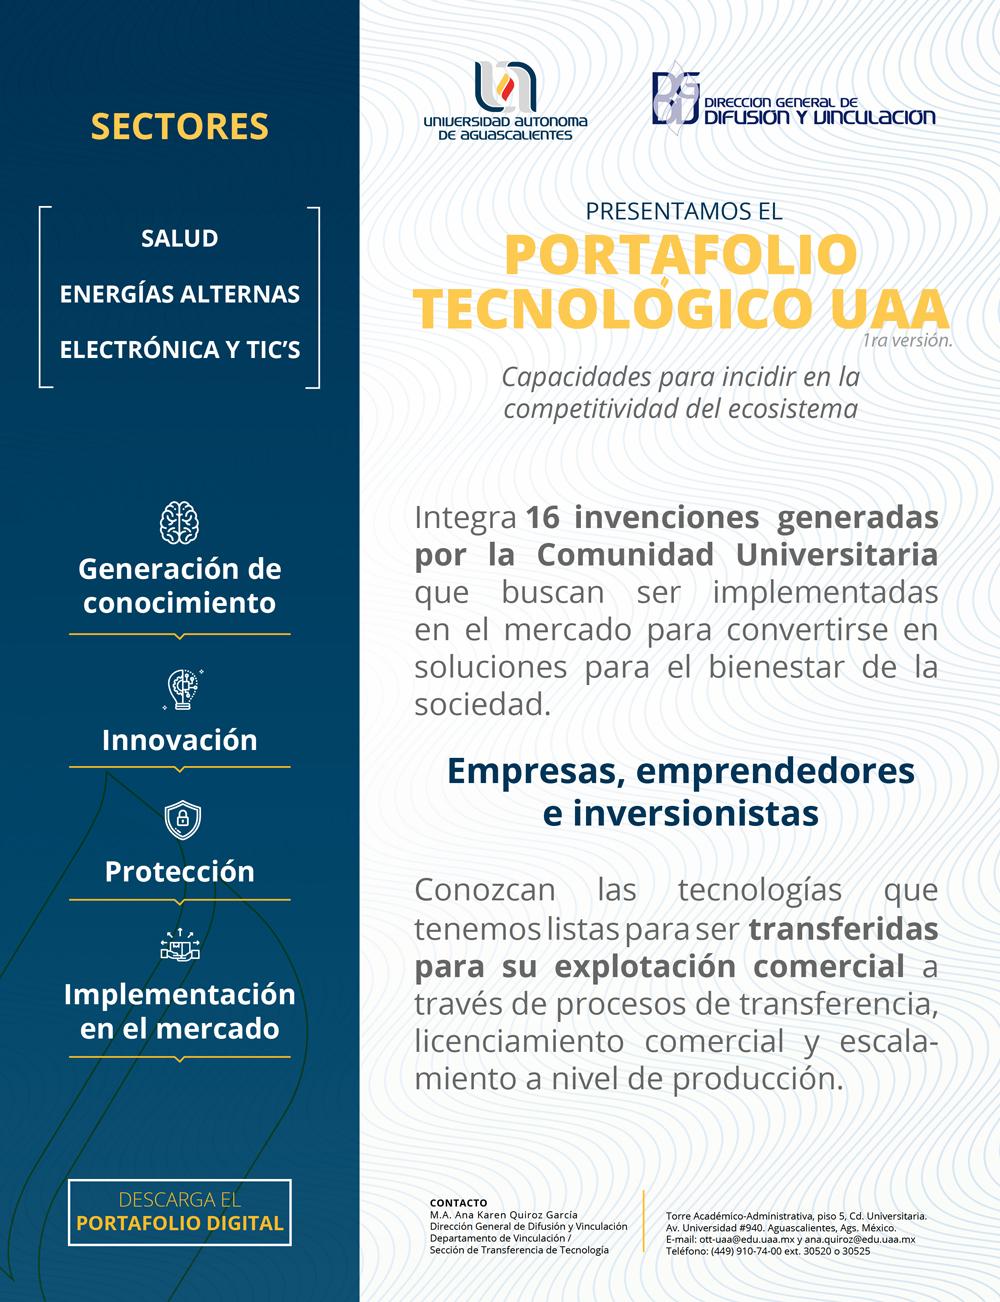 Portafolio Tecnológico UAA